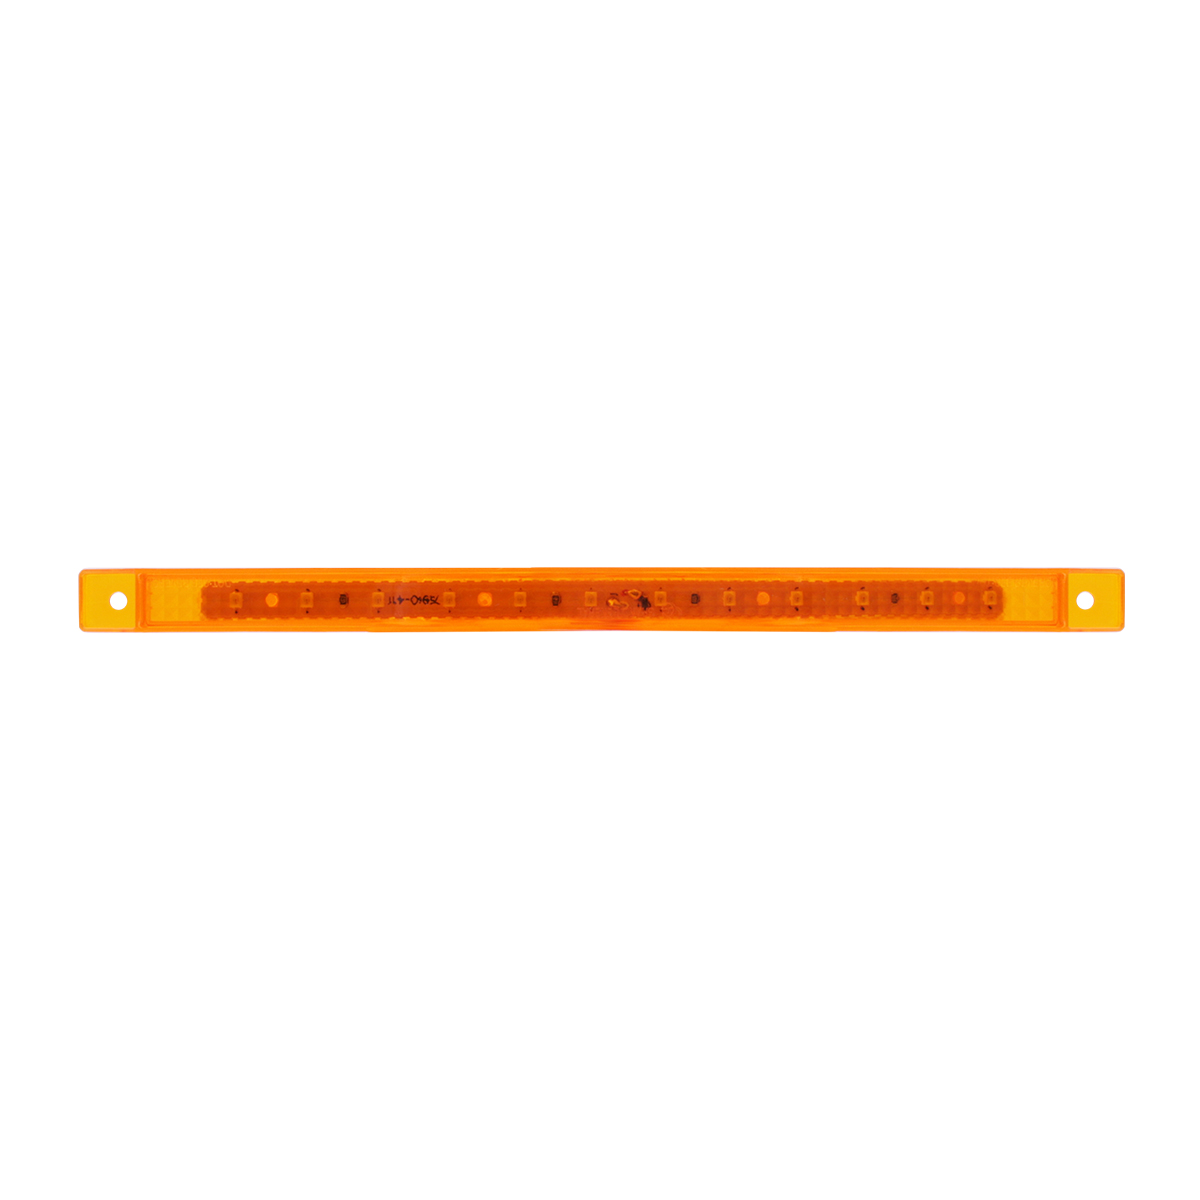 "75960 10-1/8"" Ultra Thin LED Marker Light"